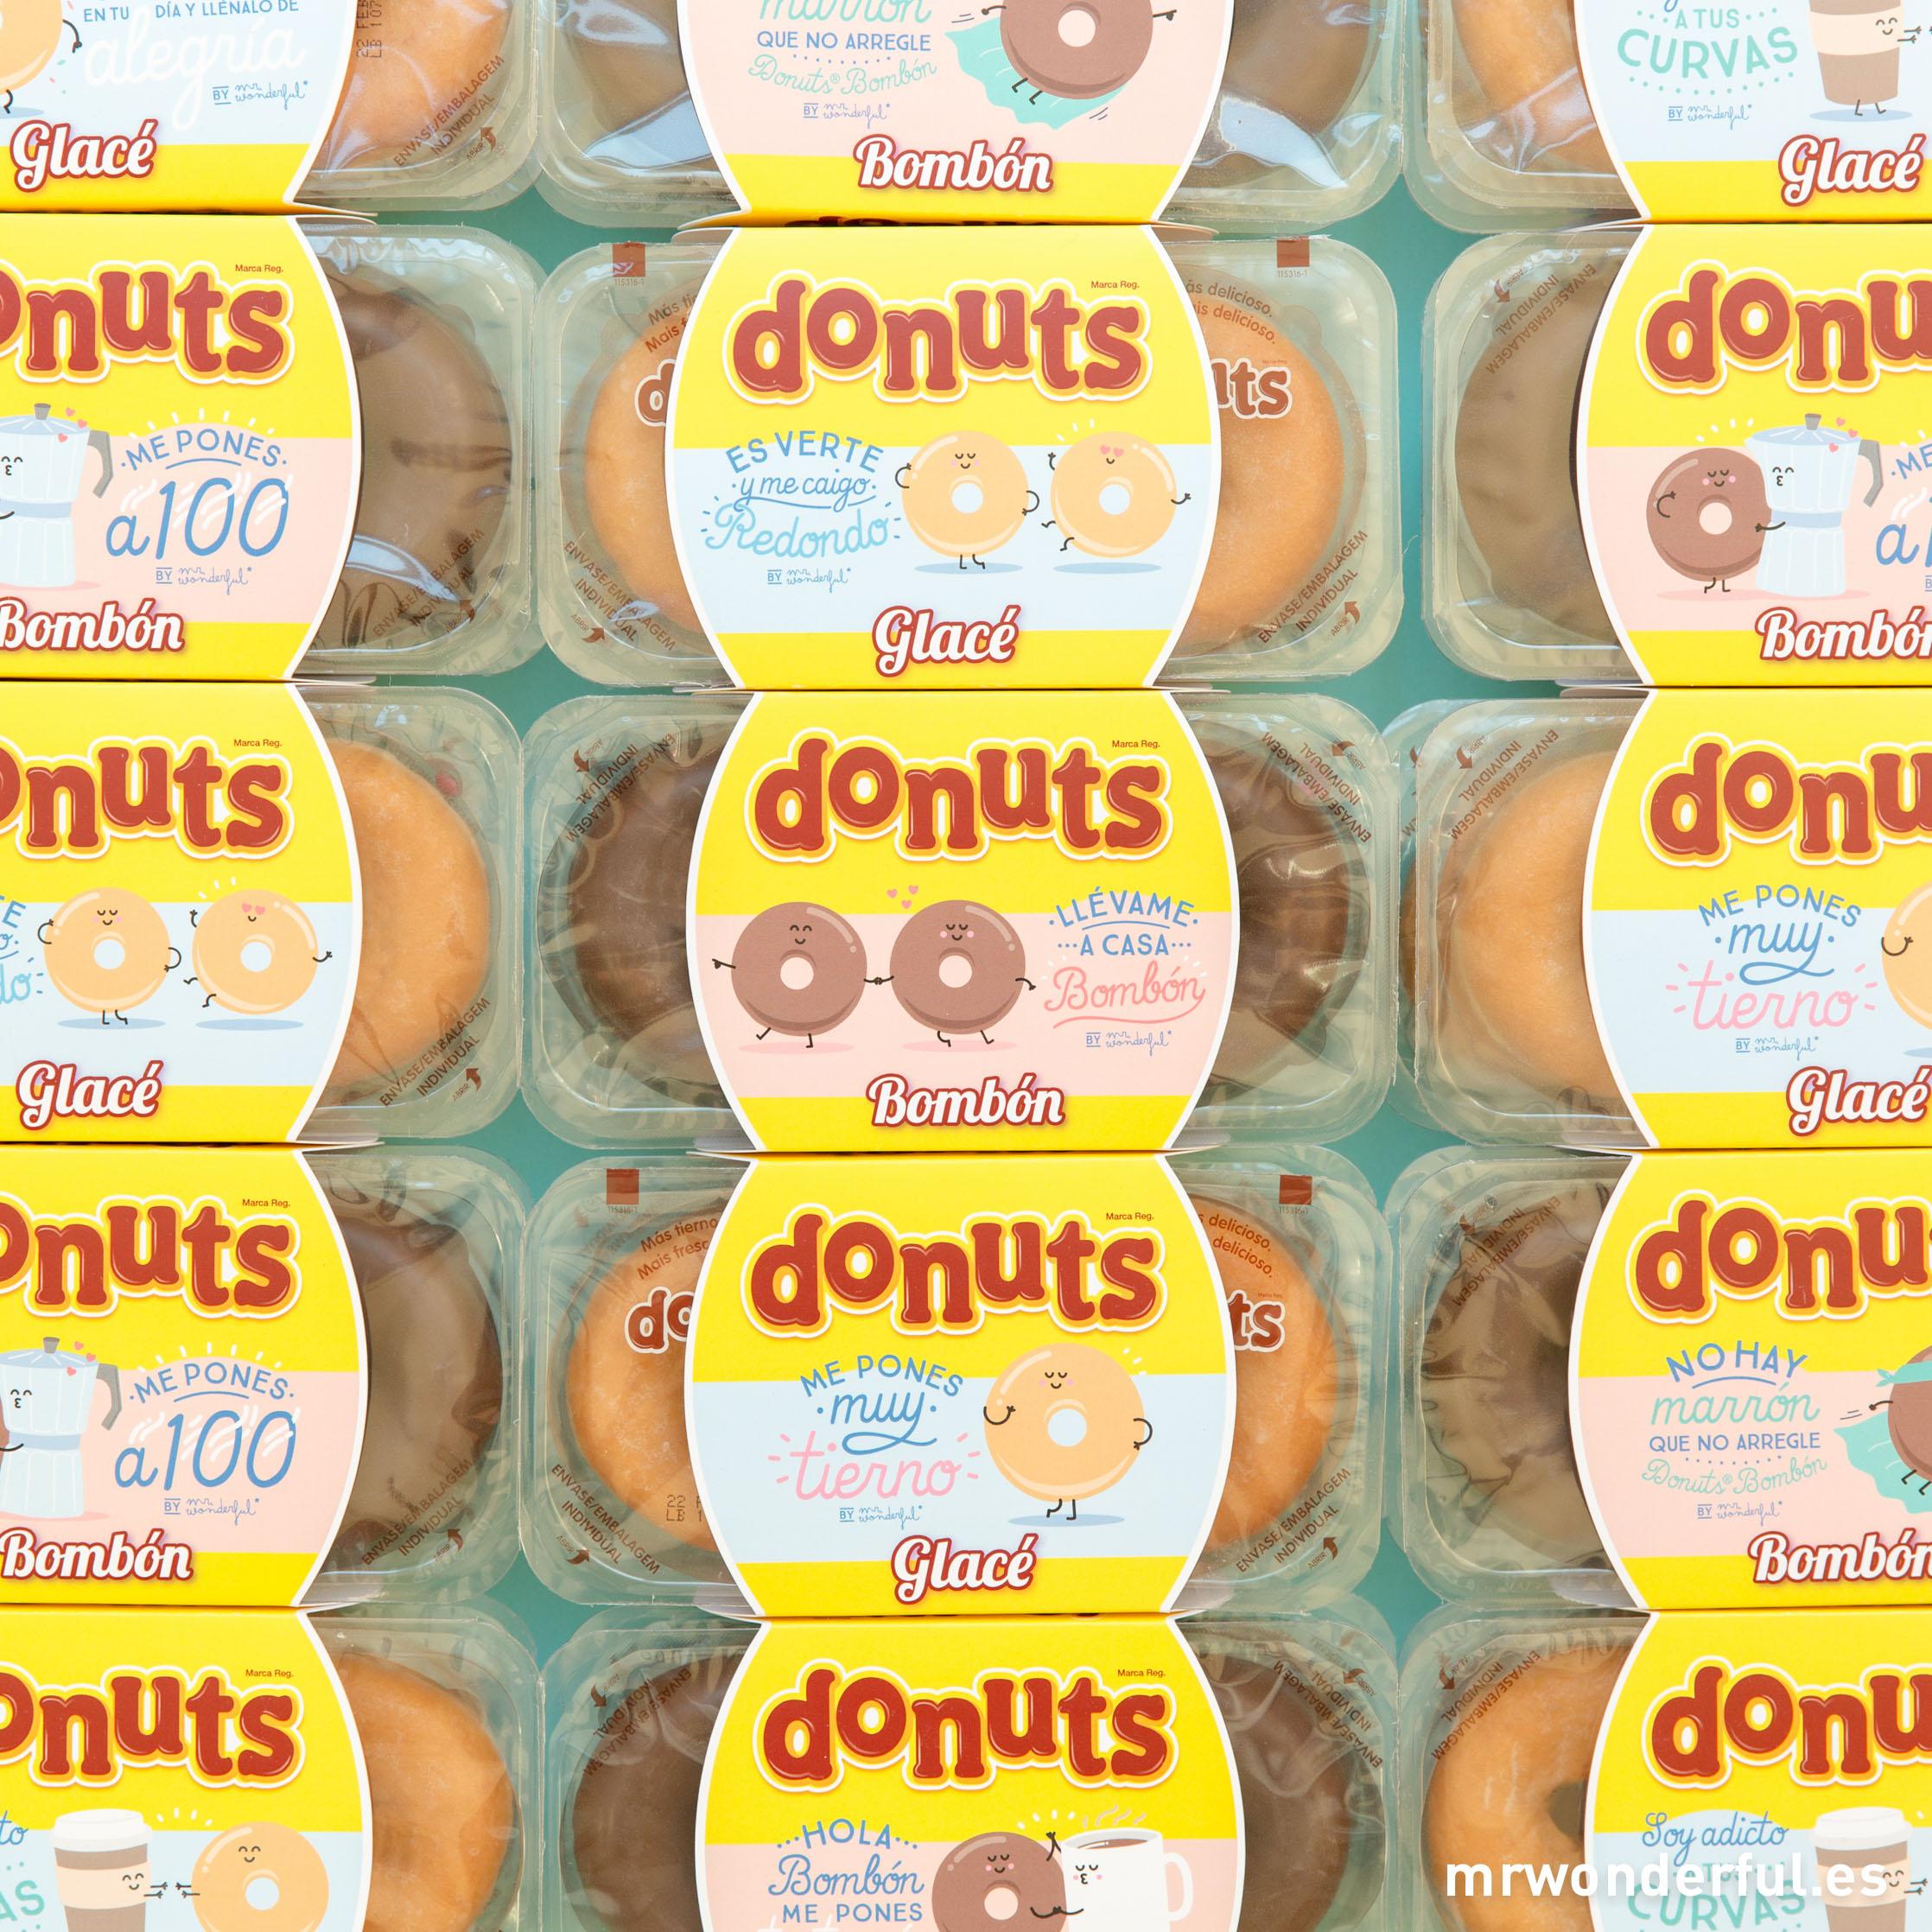 mrwonderful_donuts-2016-4-2-Editar